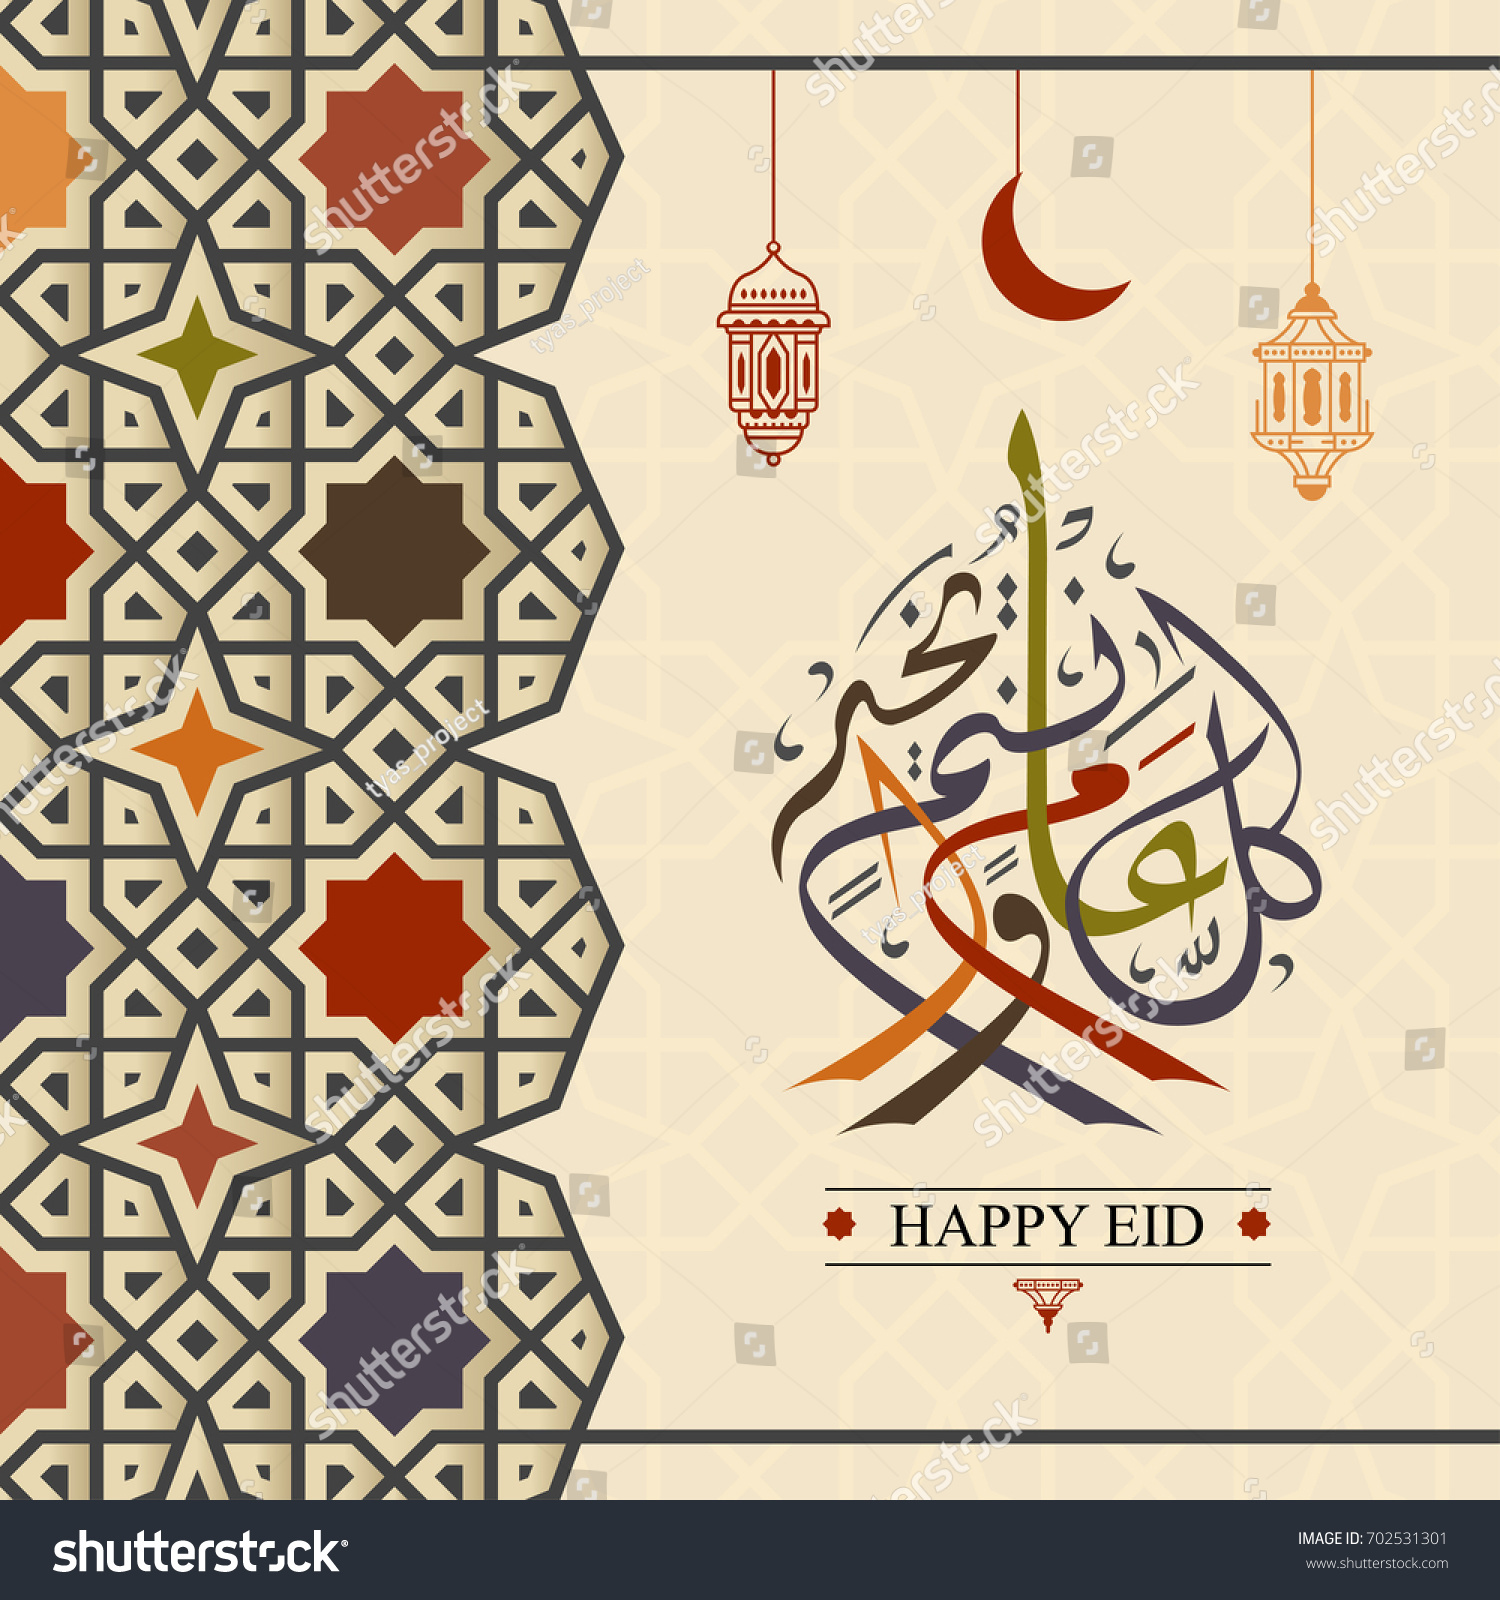 Eid Mubarak Happy New Year Greetings Stock Vector Royalty Free